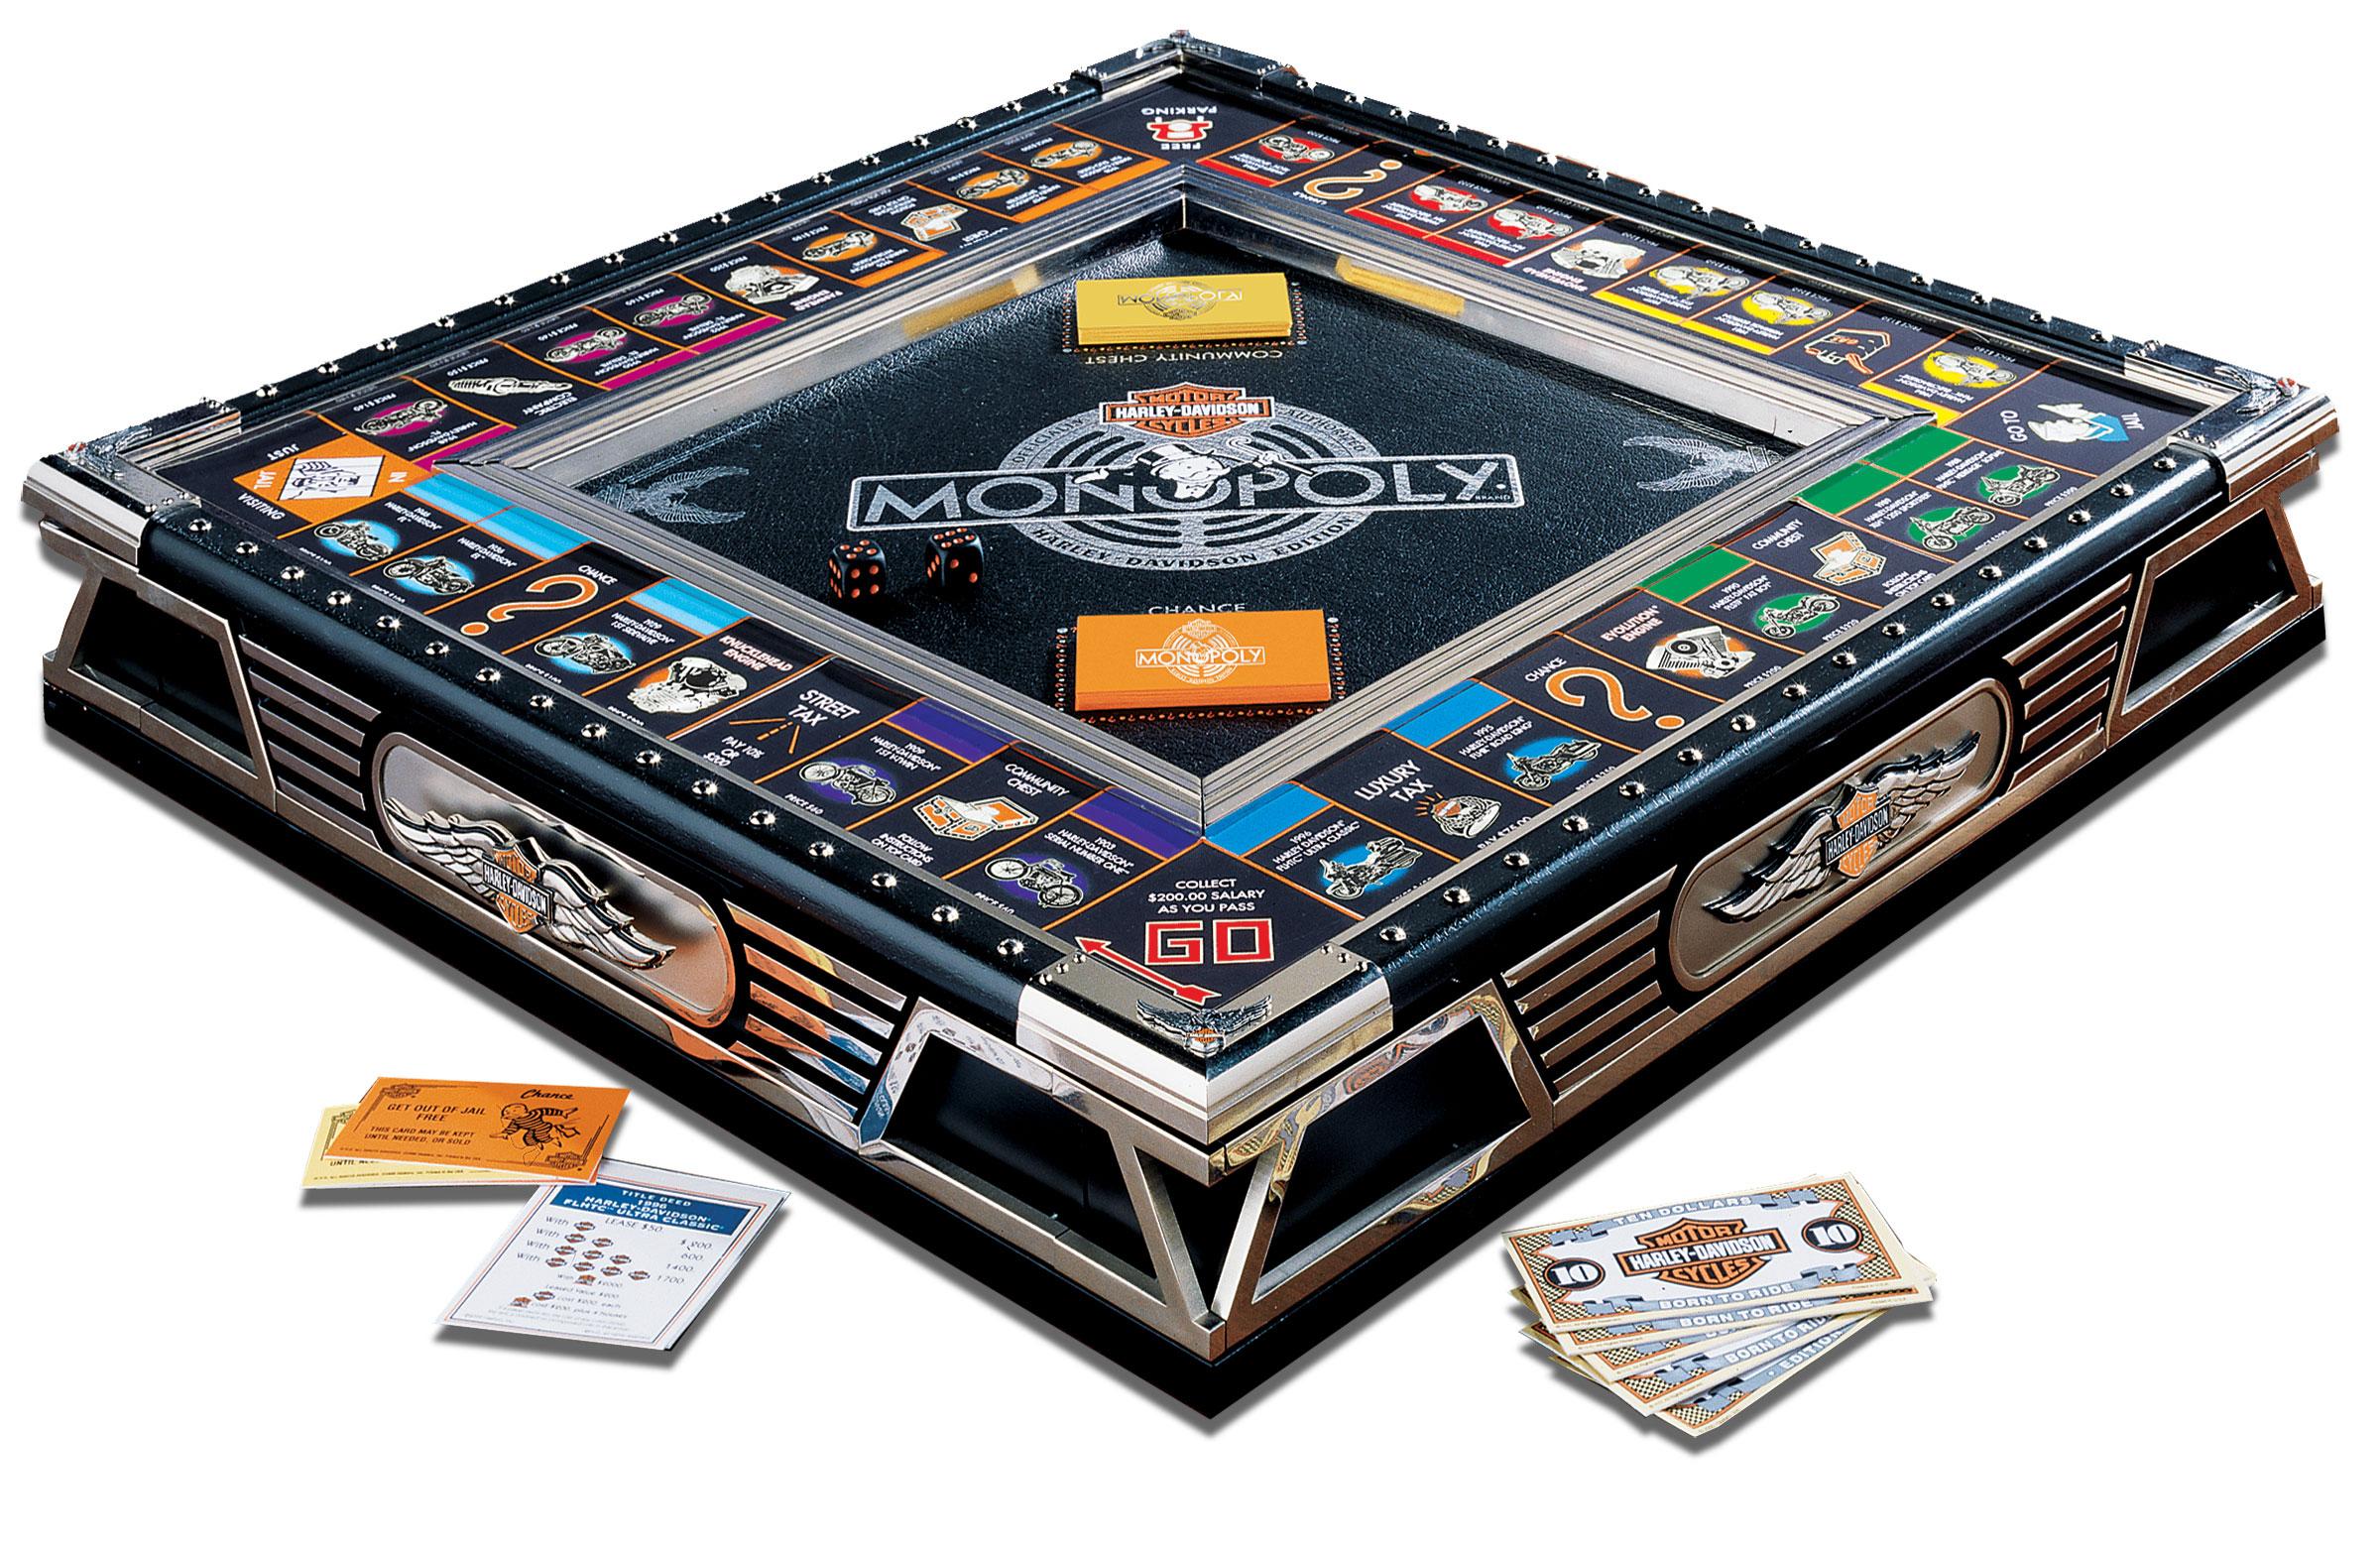 The Franklin Mint Monopol Harley Davidson Monopoly